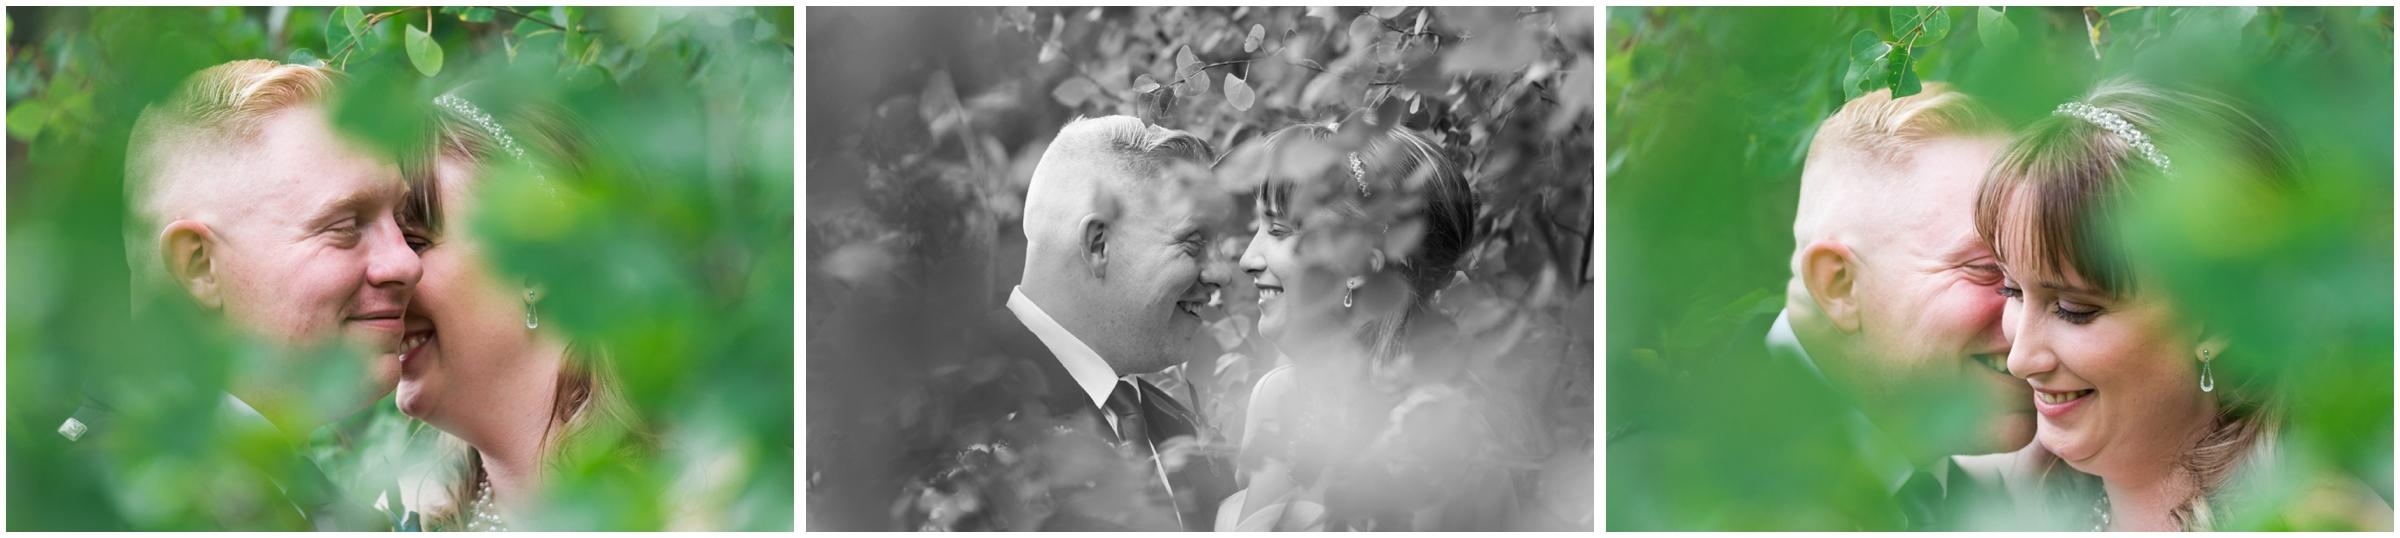 Lauren and Kyle Blog (Selena Phillips-Boyle)_0055.jpg